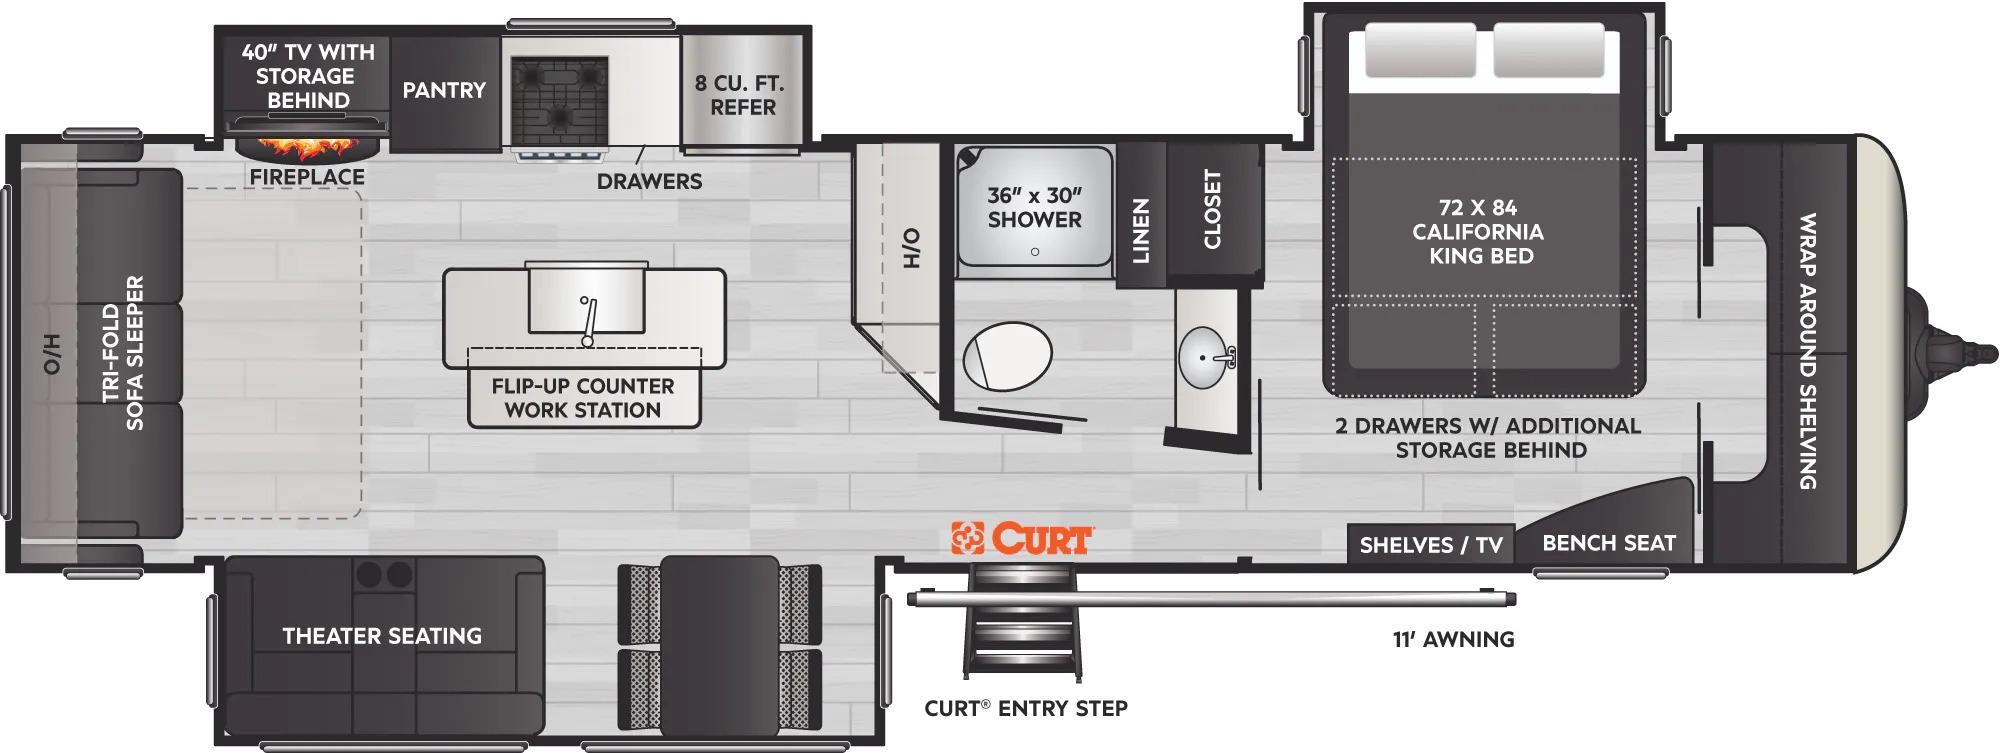 View Floor Plan for 2022 KEYSTONE ARCADIA 370RL